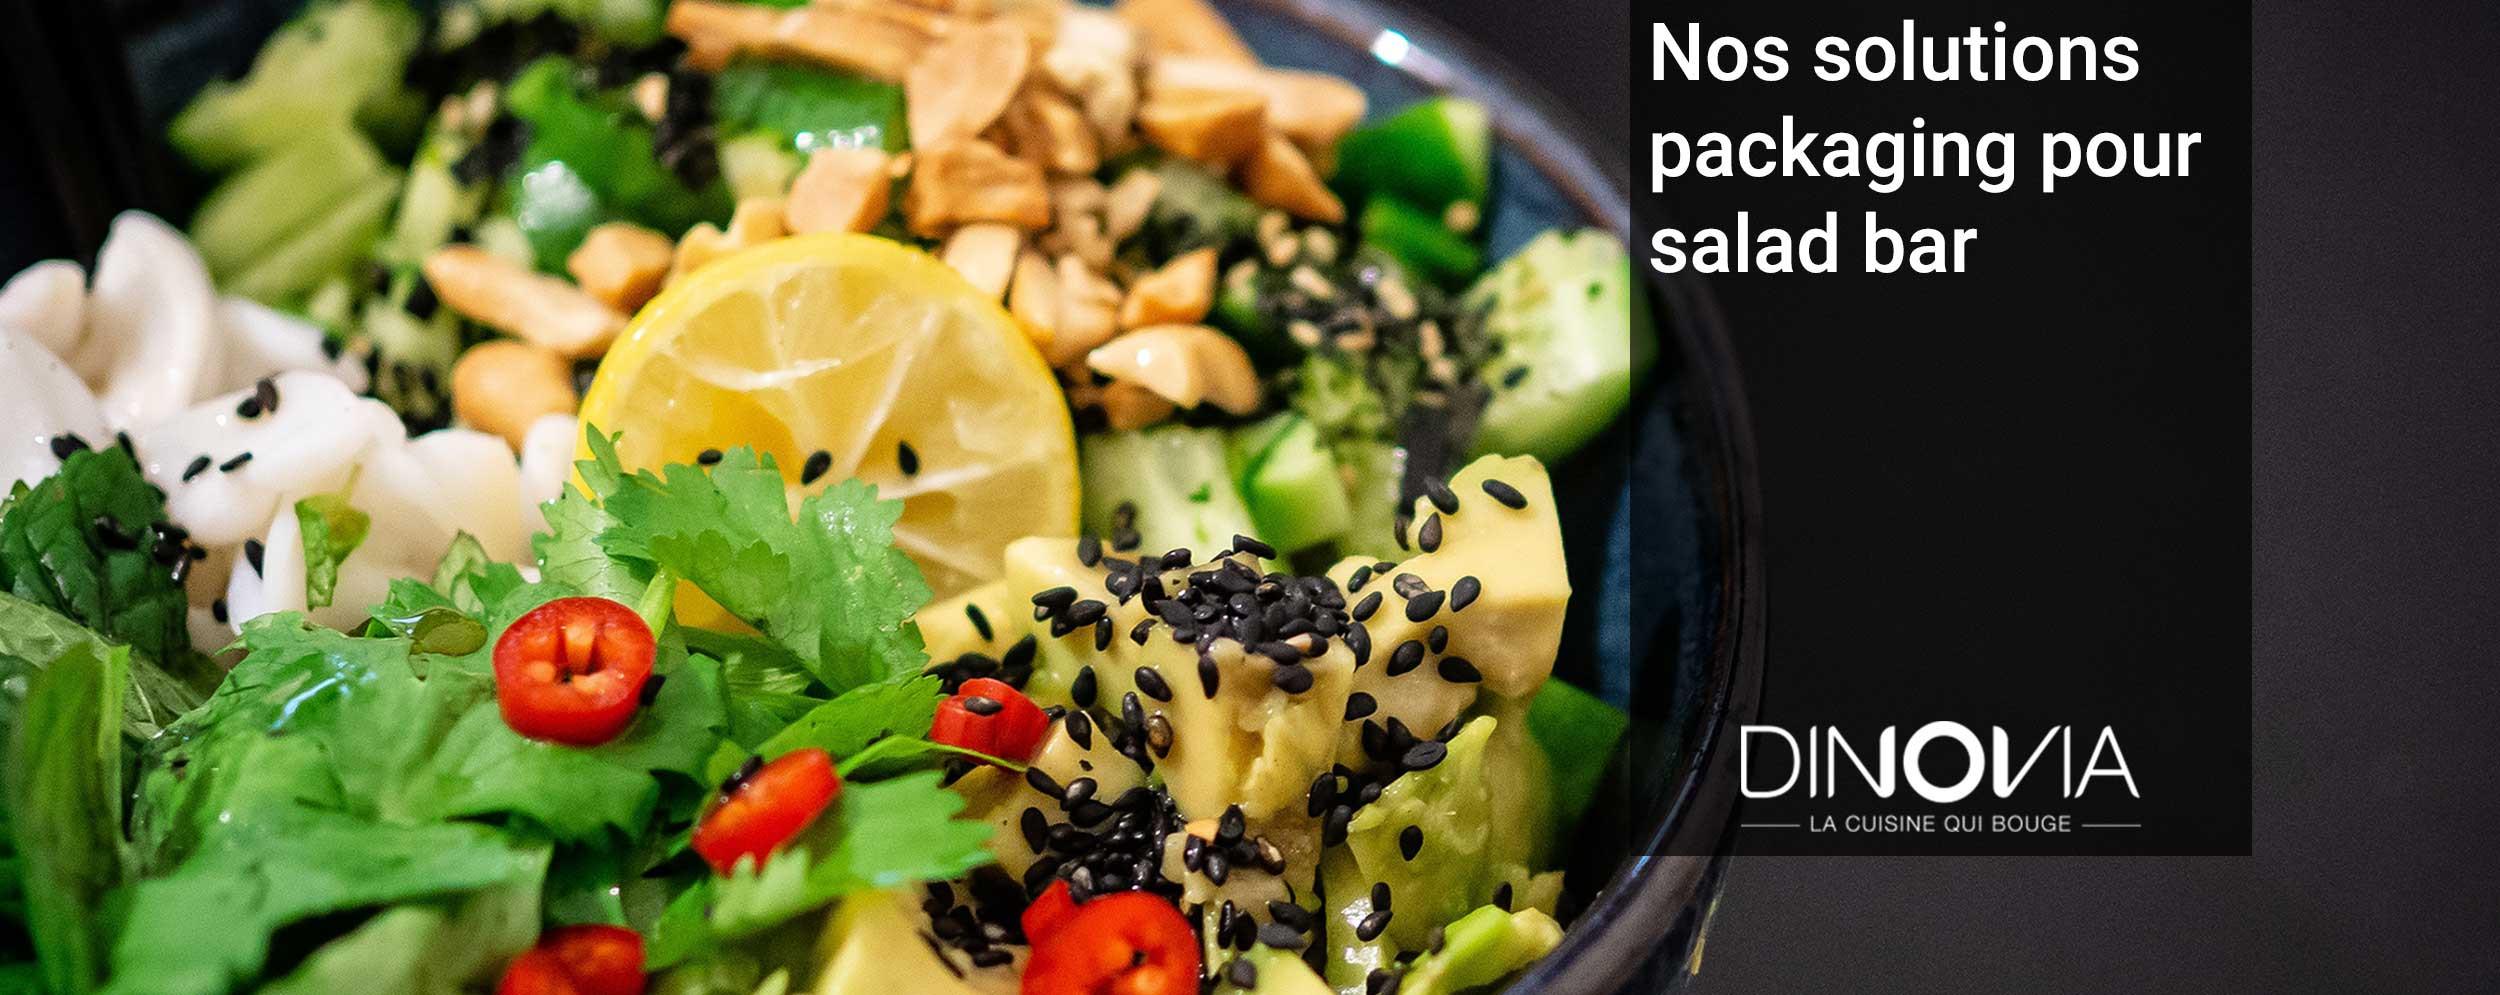 emballage salade vente a emporter